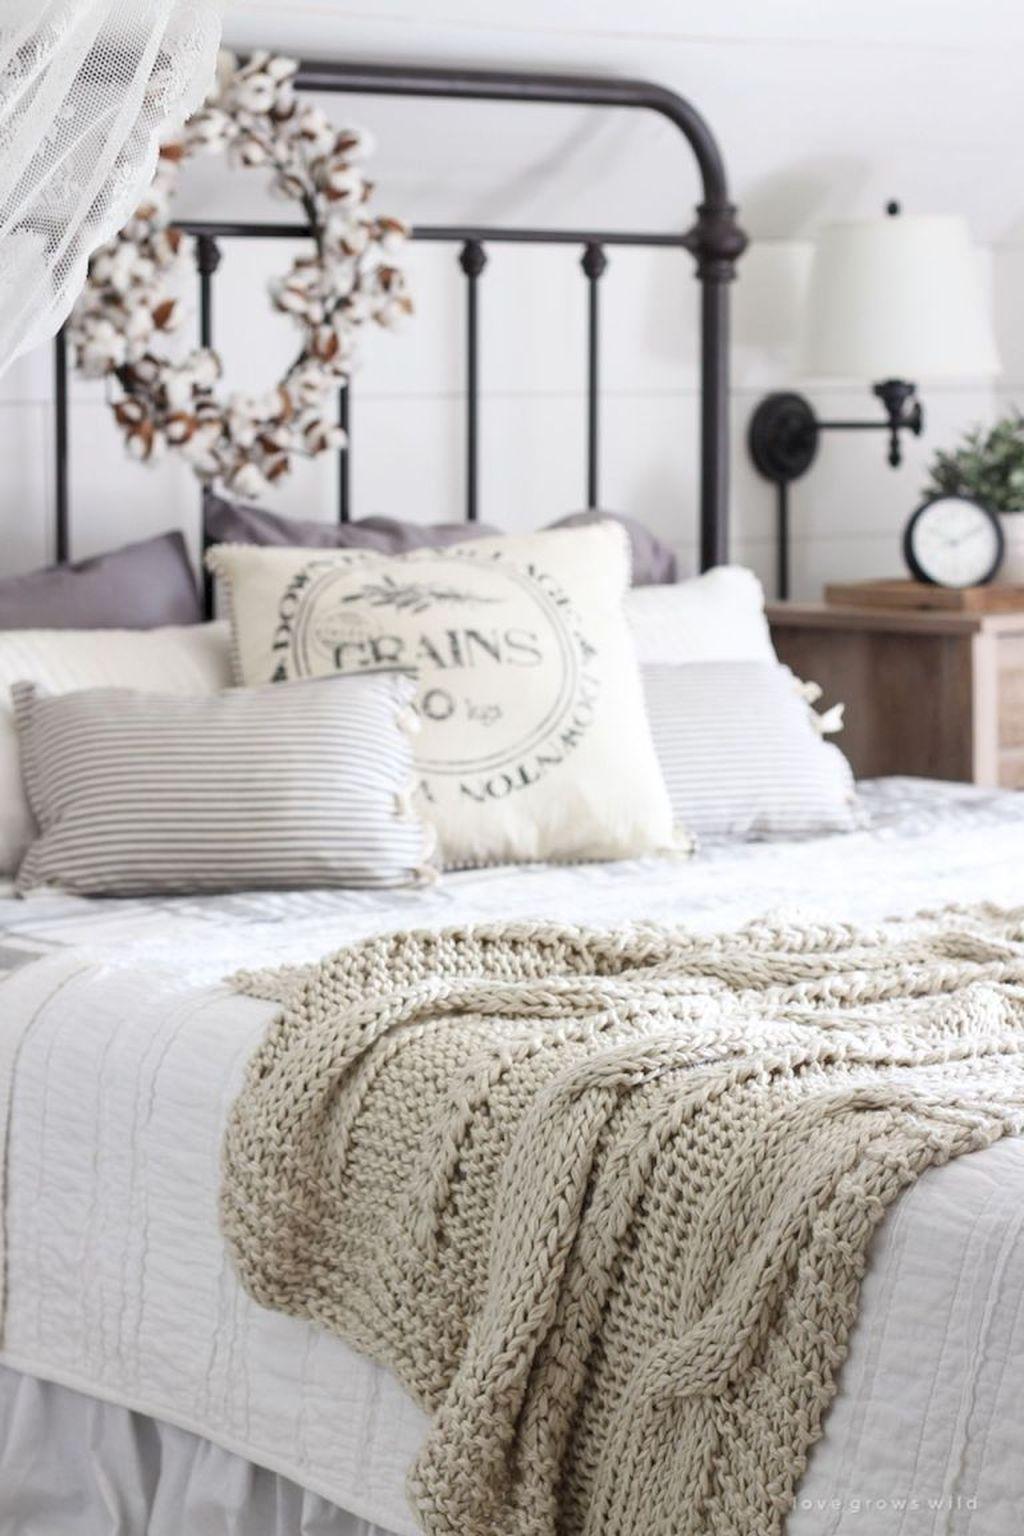 Room decoration ideas for college girls  romantic rustic farmhouse master bedroom decorating ideas